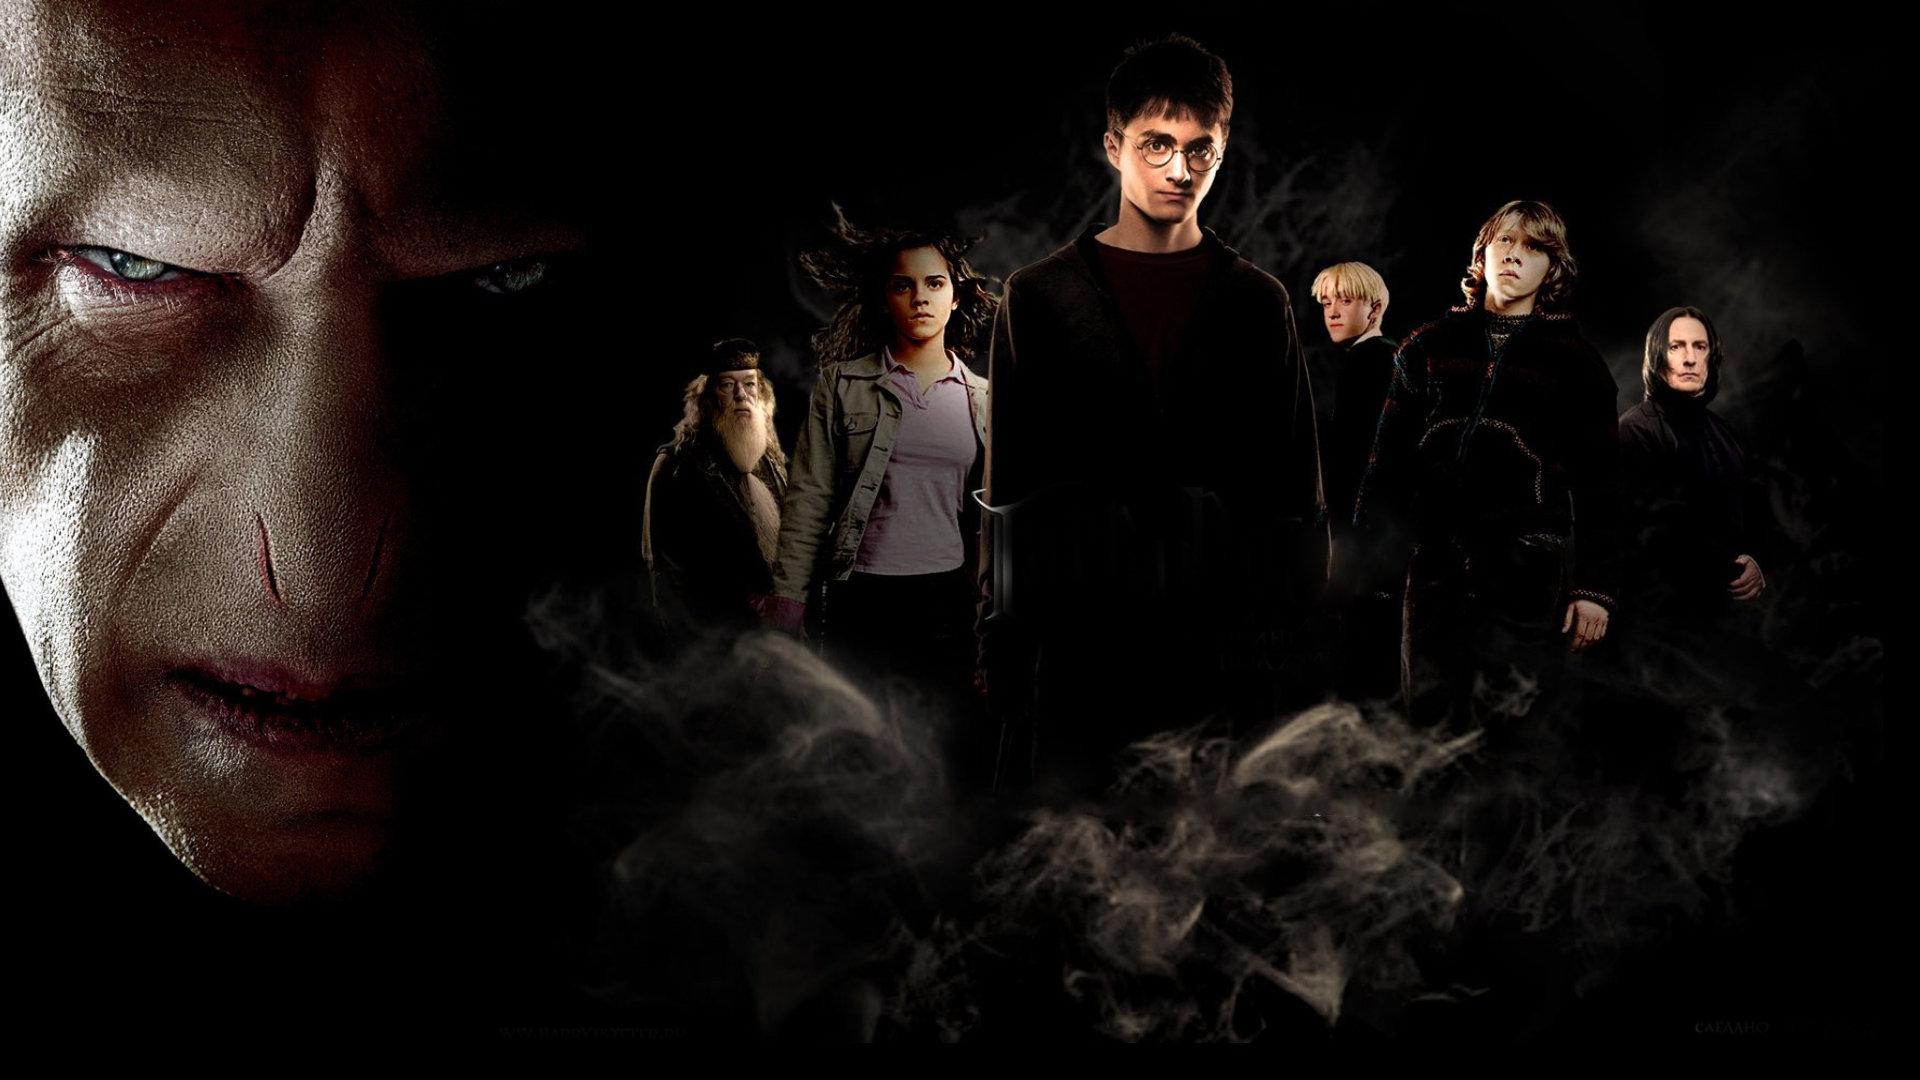 Free Download Harry Potter Wallpaper ID463337 Hd 1080p For Desktop